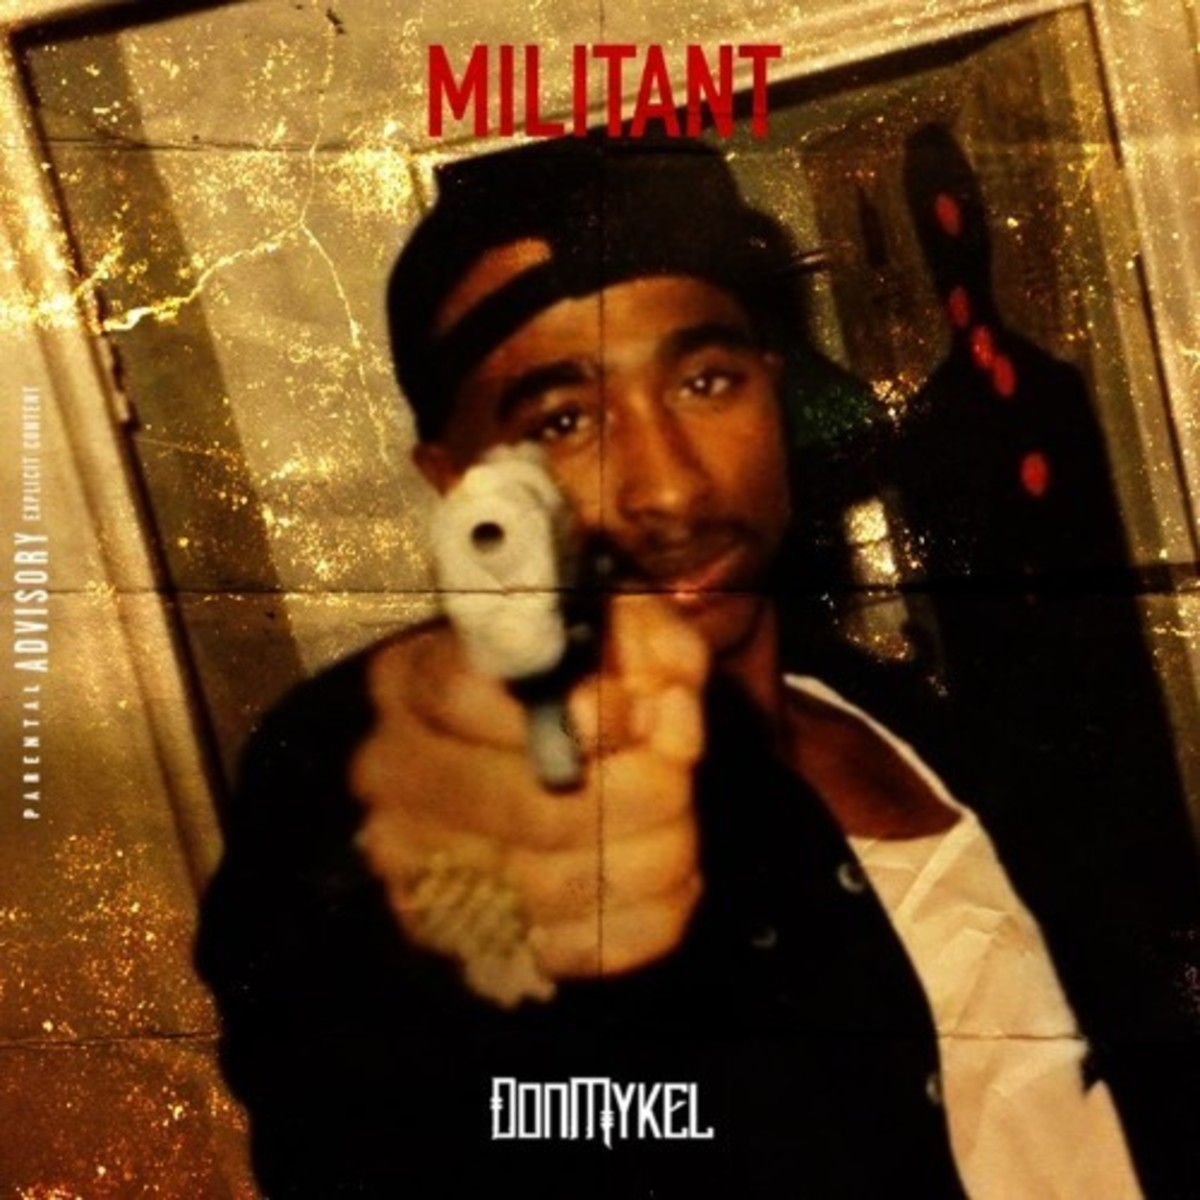 don-mykel-militant.jpg